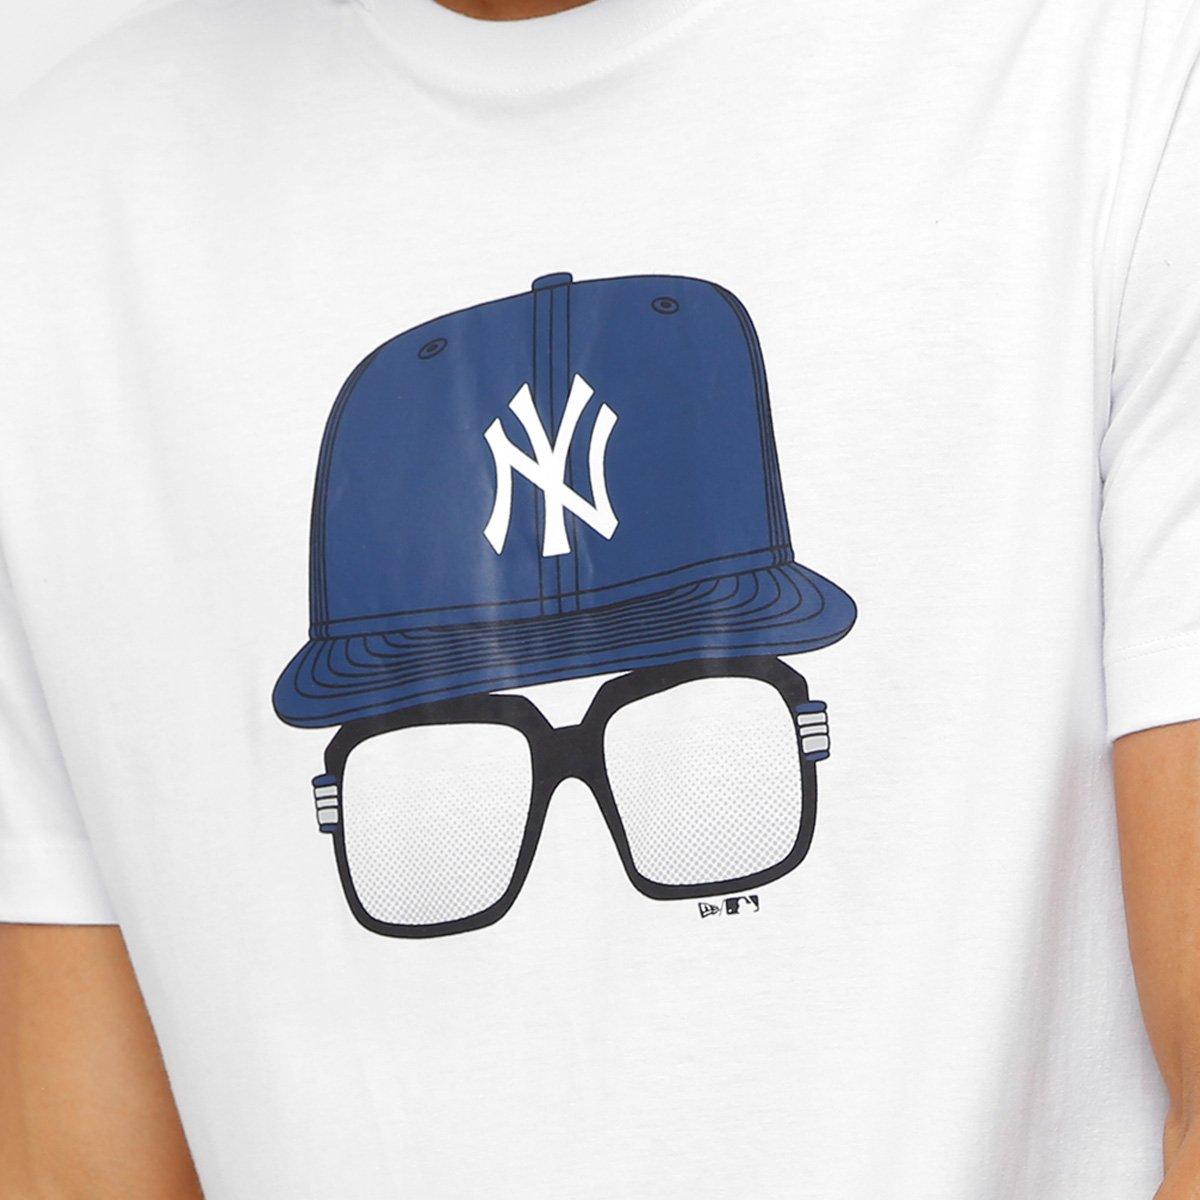 Camiseta MLB New York Yankees New Era 9 Cap Glasses Masculina ... 341e1ea5458